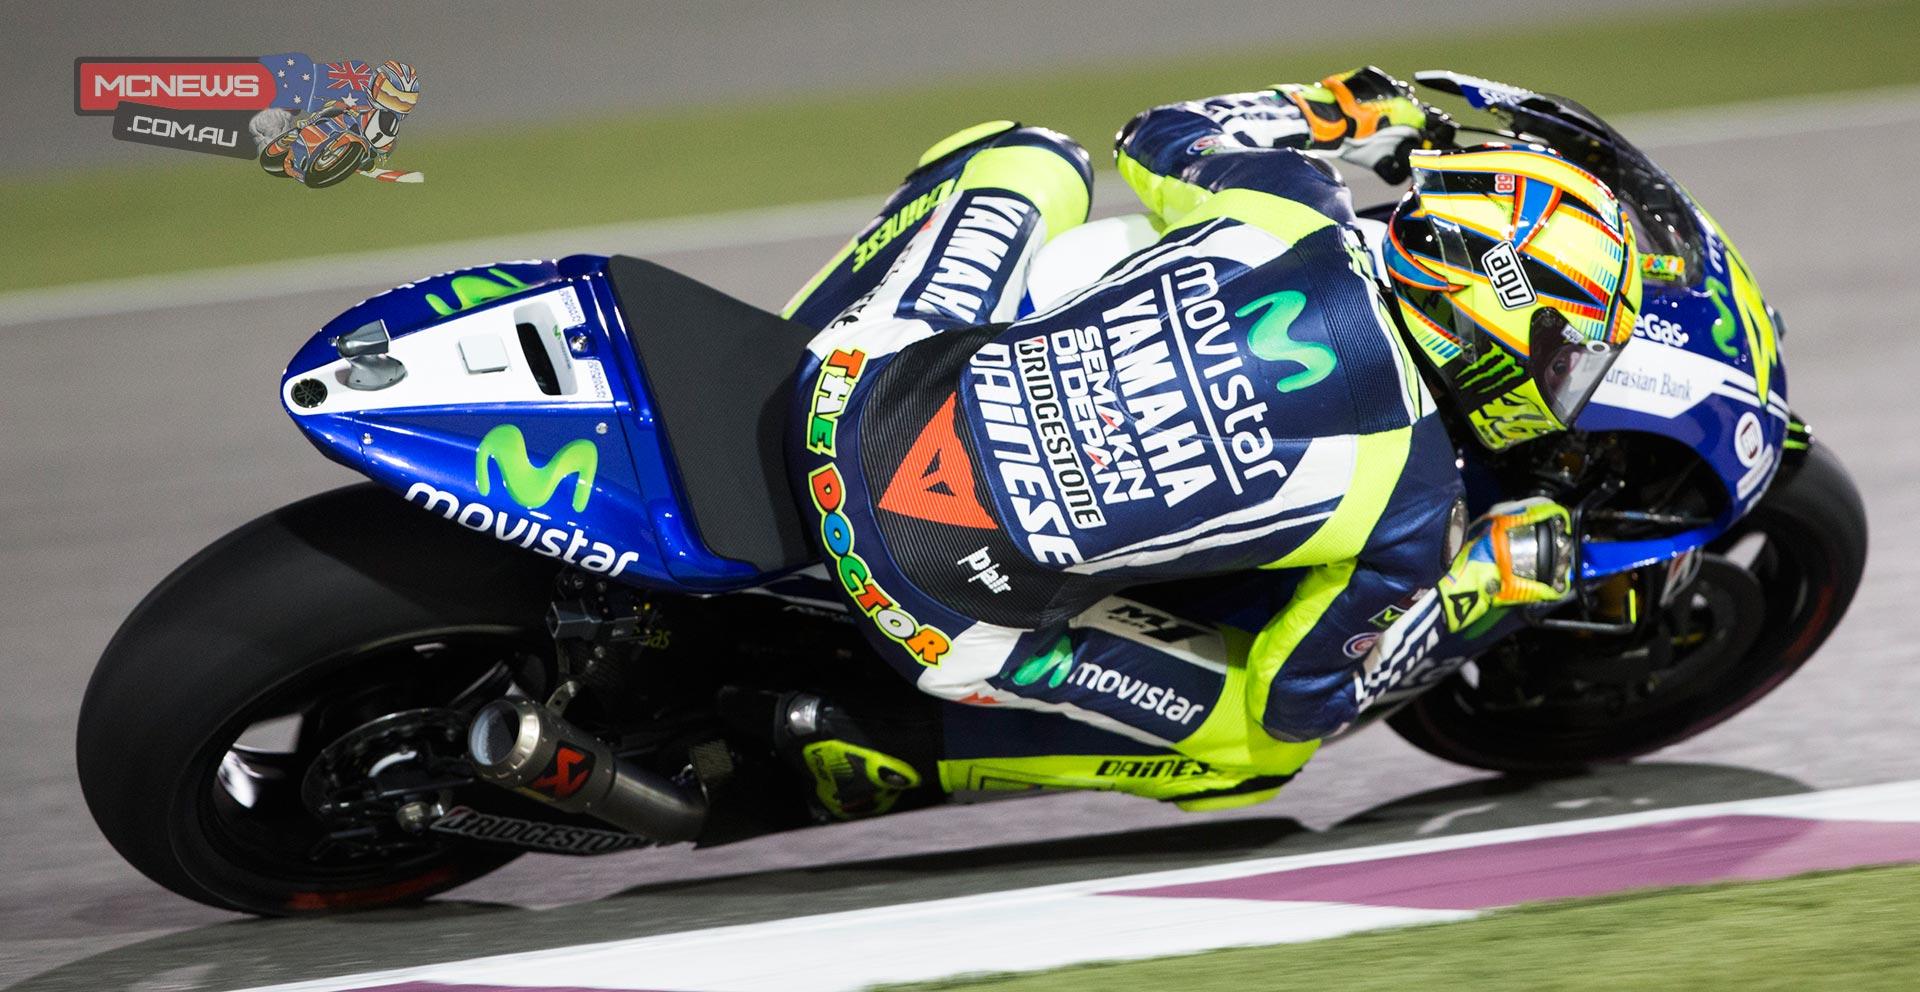 MotoGP_2014_Rnd1_ValentinoRossi_RHS.jpg